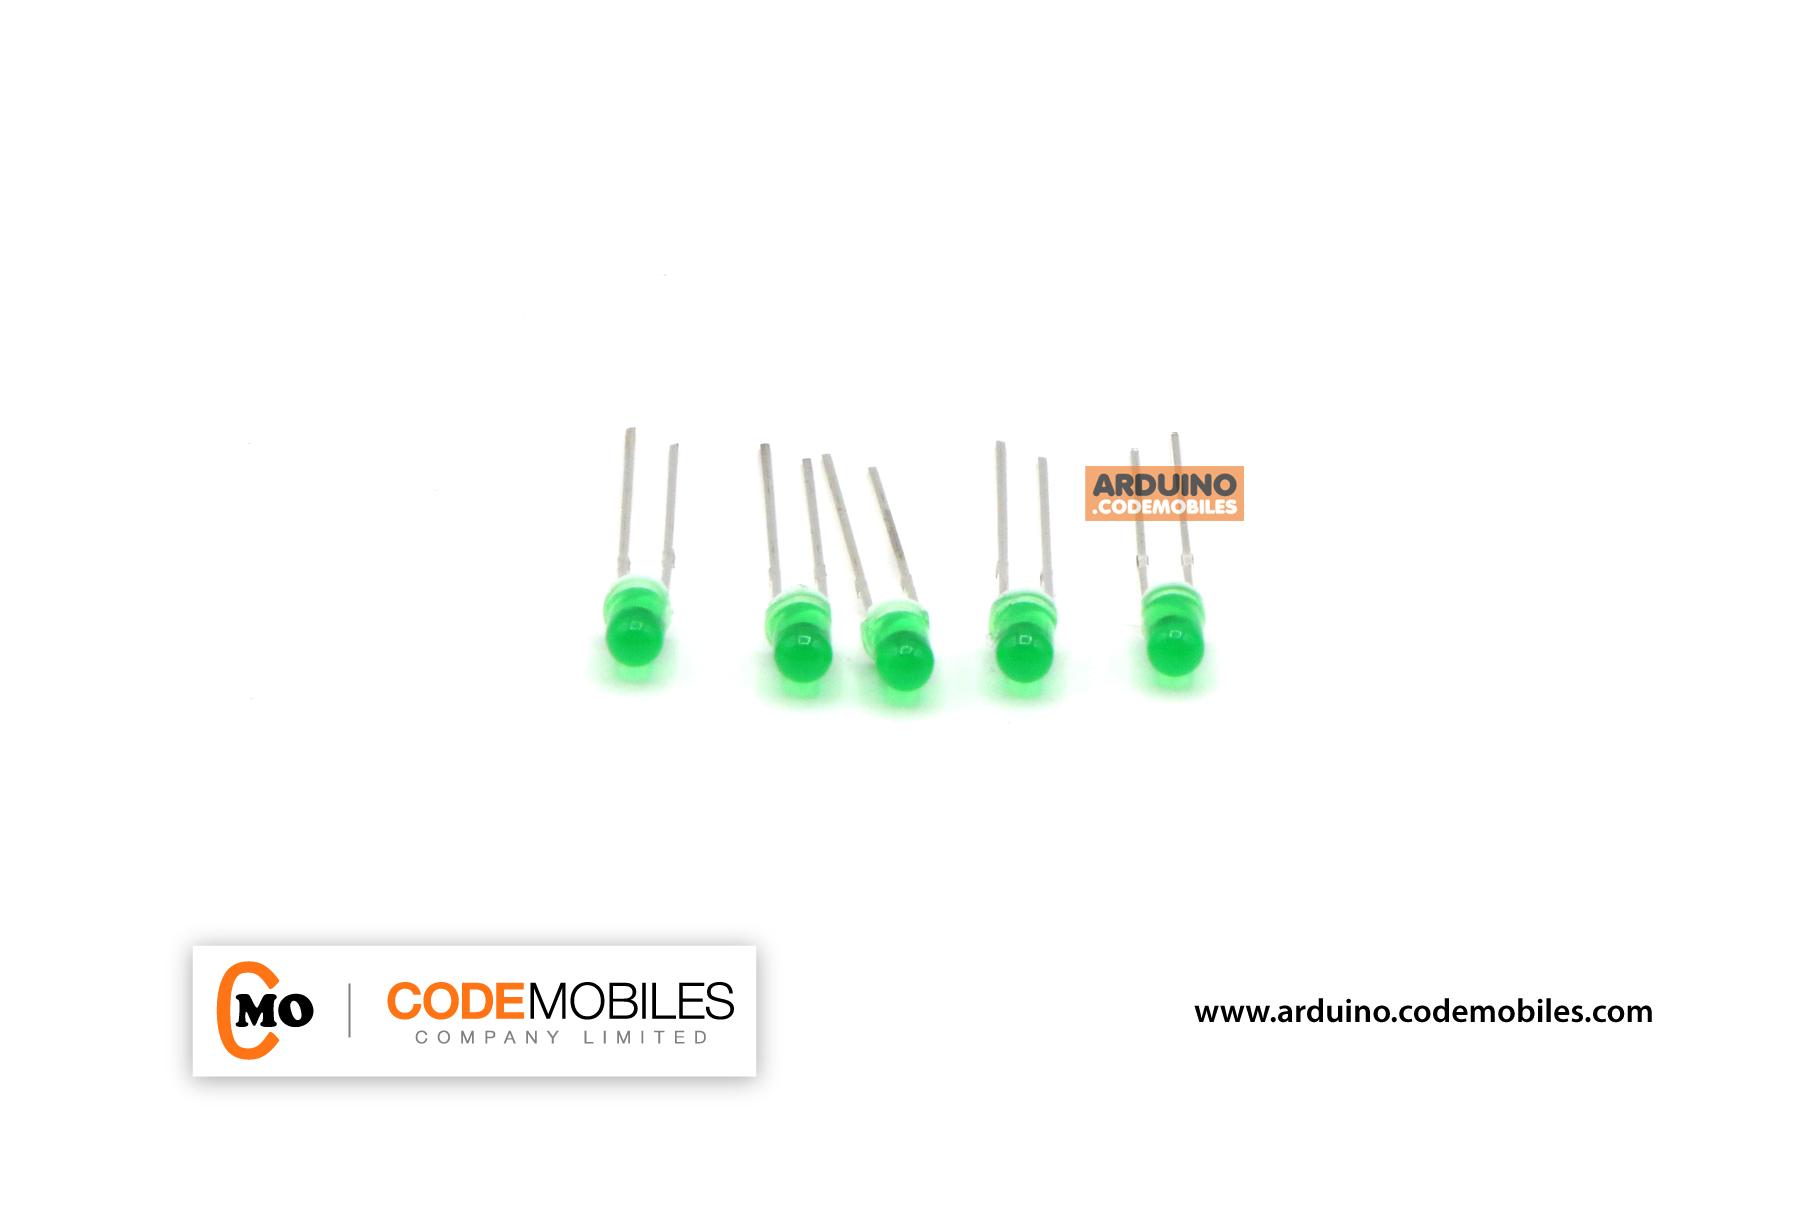 LED 3mm สีเขียว จำนวน 5 ชิ้น